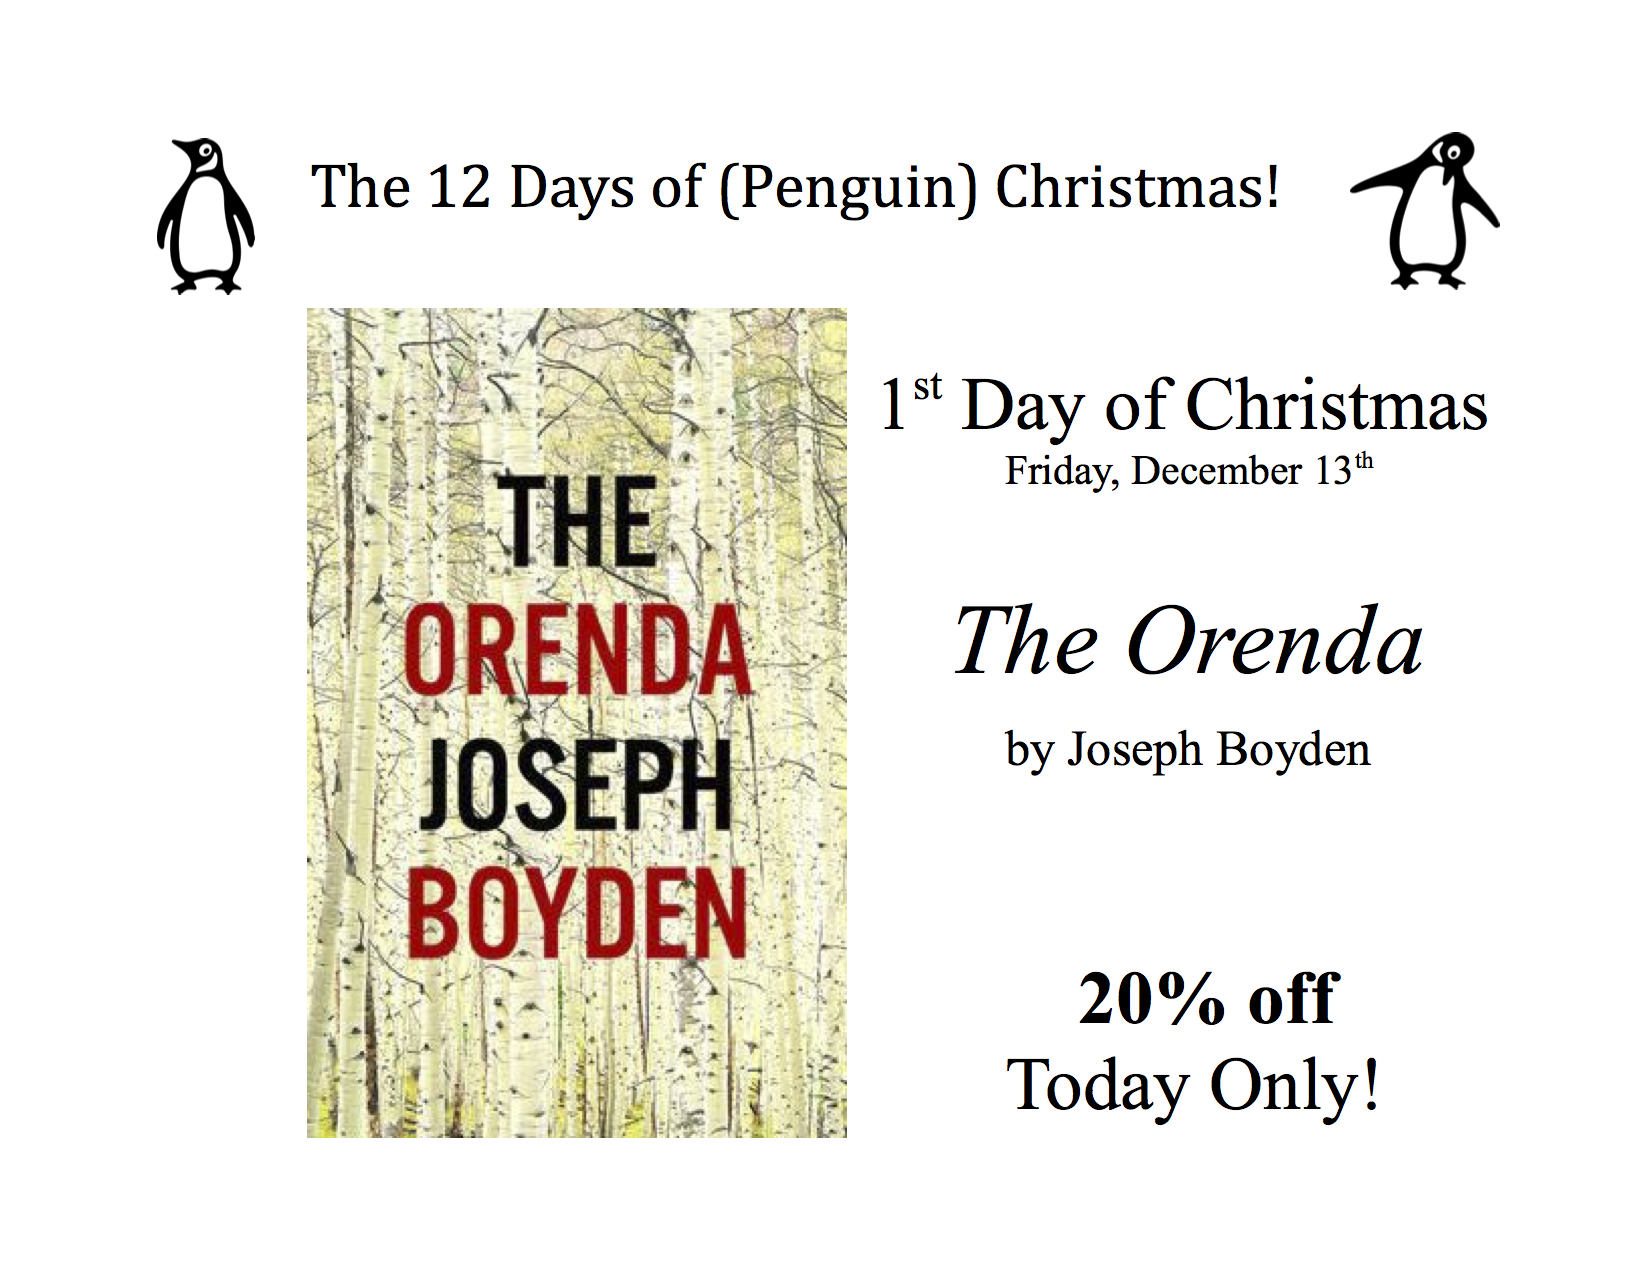 1st Day of (Penguin) Christmas – Friday, December 13th – Books On ...